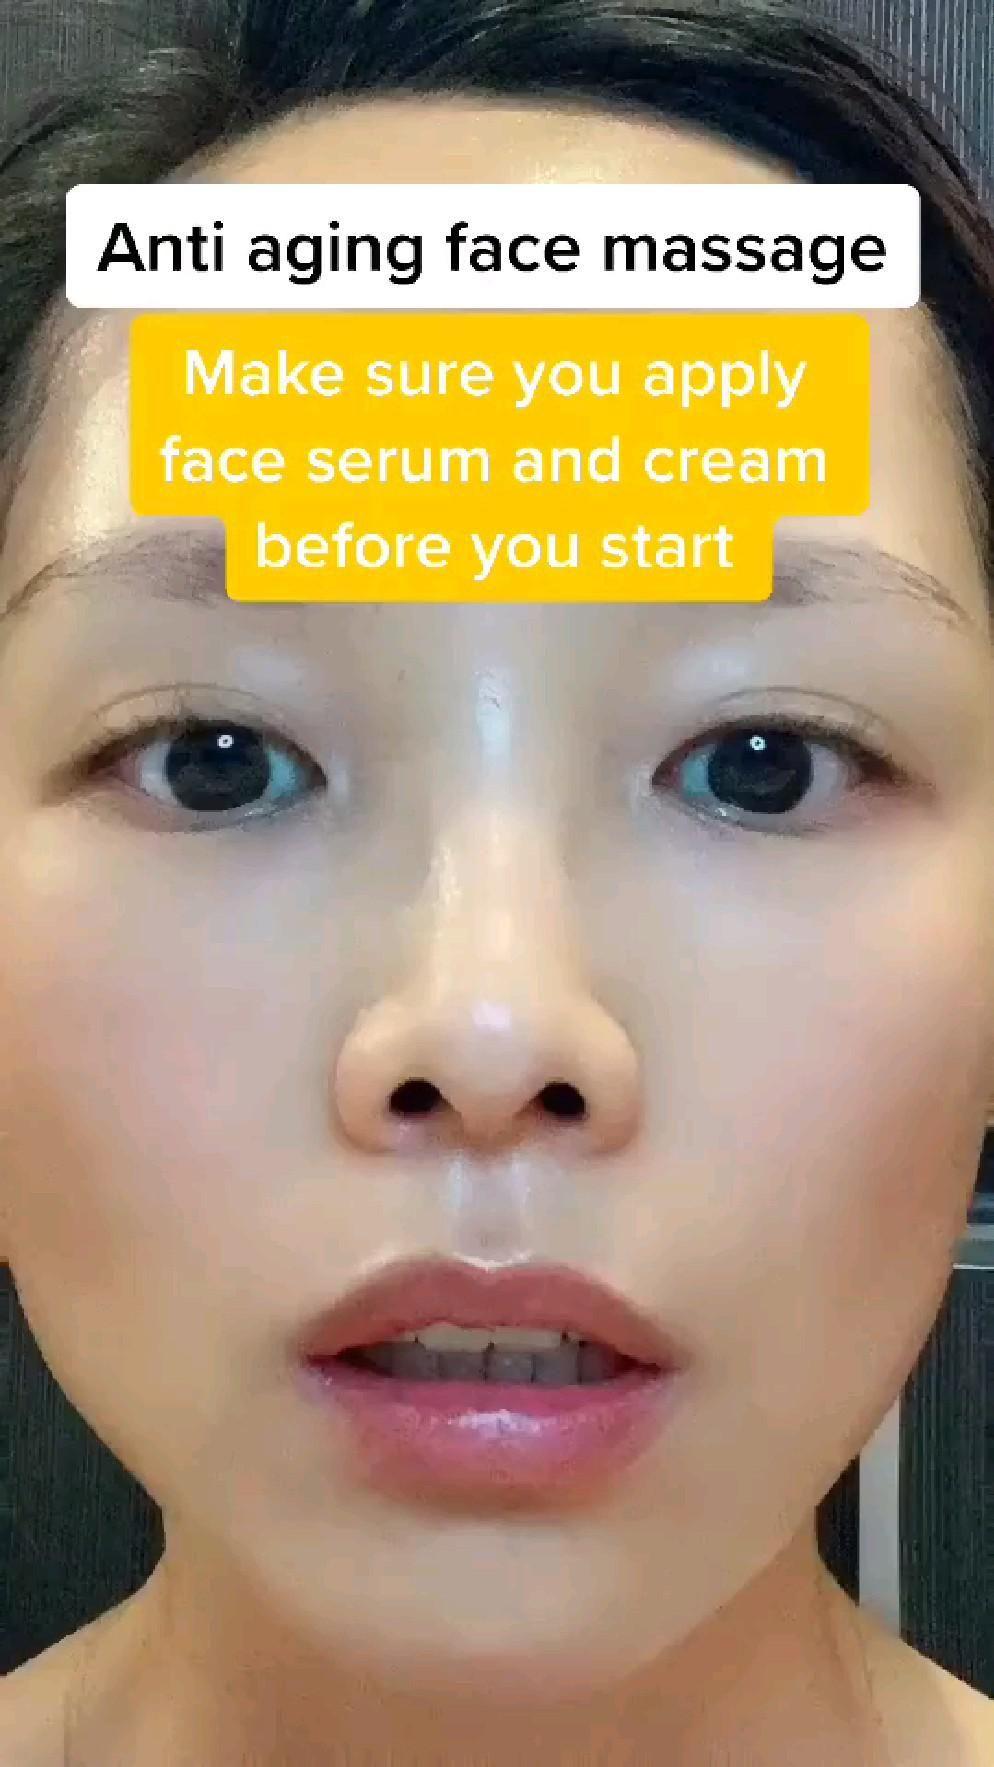 DIY Hyaluronic Acid Serum for Affordable Natural Anti-Aging Skin Care